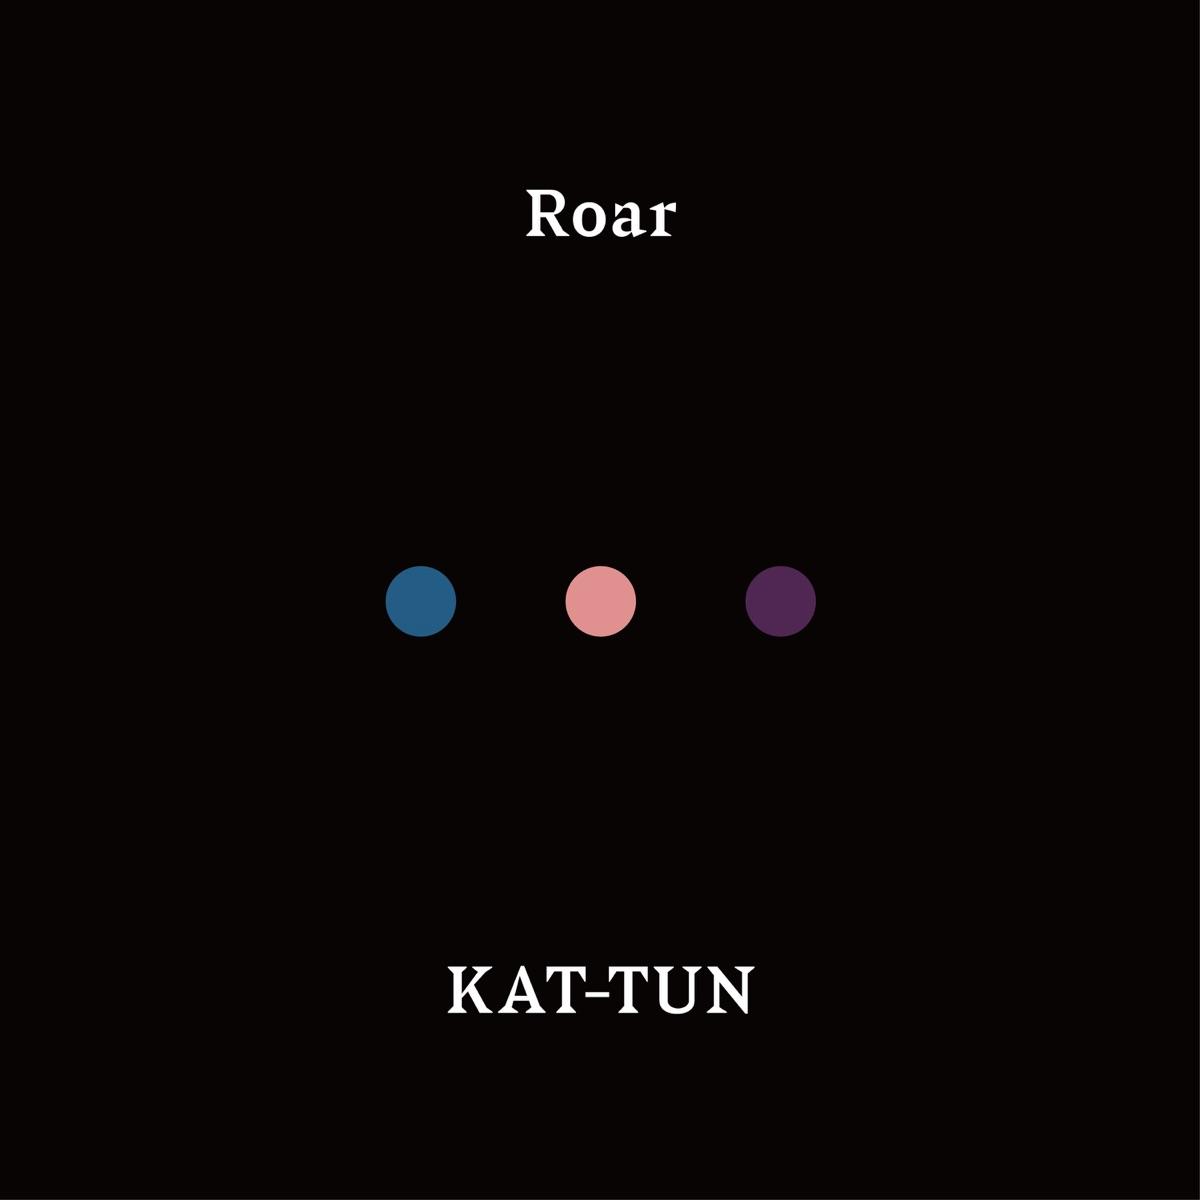 『KAT-TUN - Flashback』収録の『Roar』ジャケット